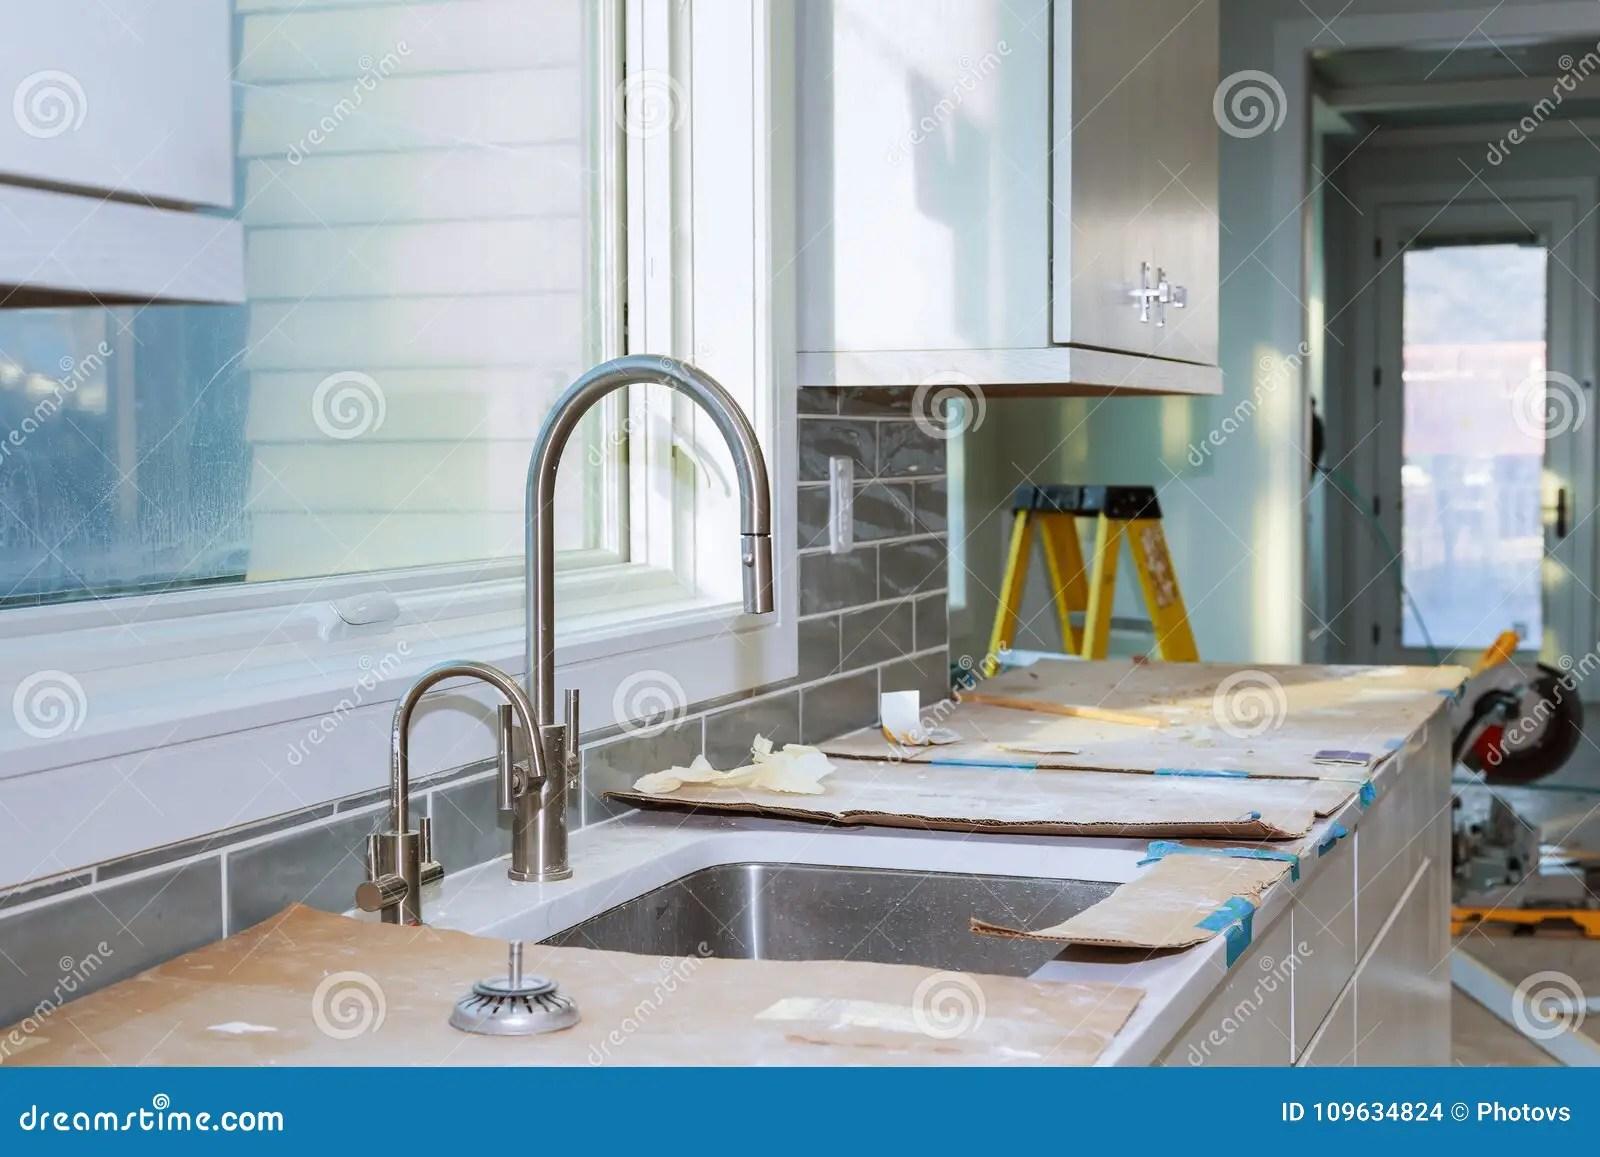 remodel a kitchen and bath remodeling contractors 厨柜设施改善改造worm x27 在一个新的厨房安装的s视图库存照片 图片 厨柜设施改善厨房改造worm 在一个新的厨房安装的s视图